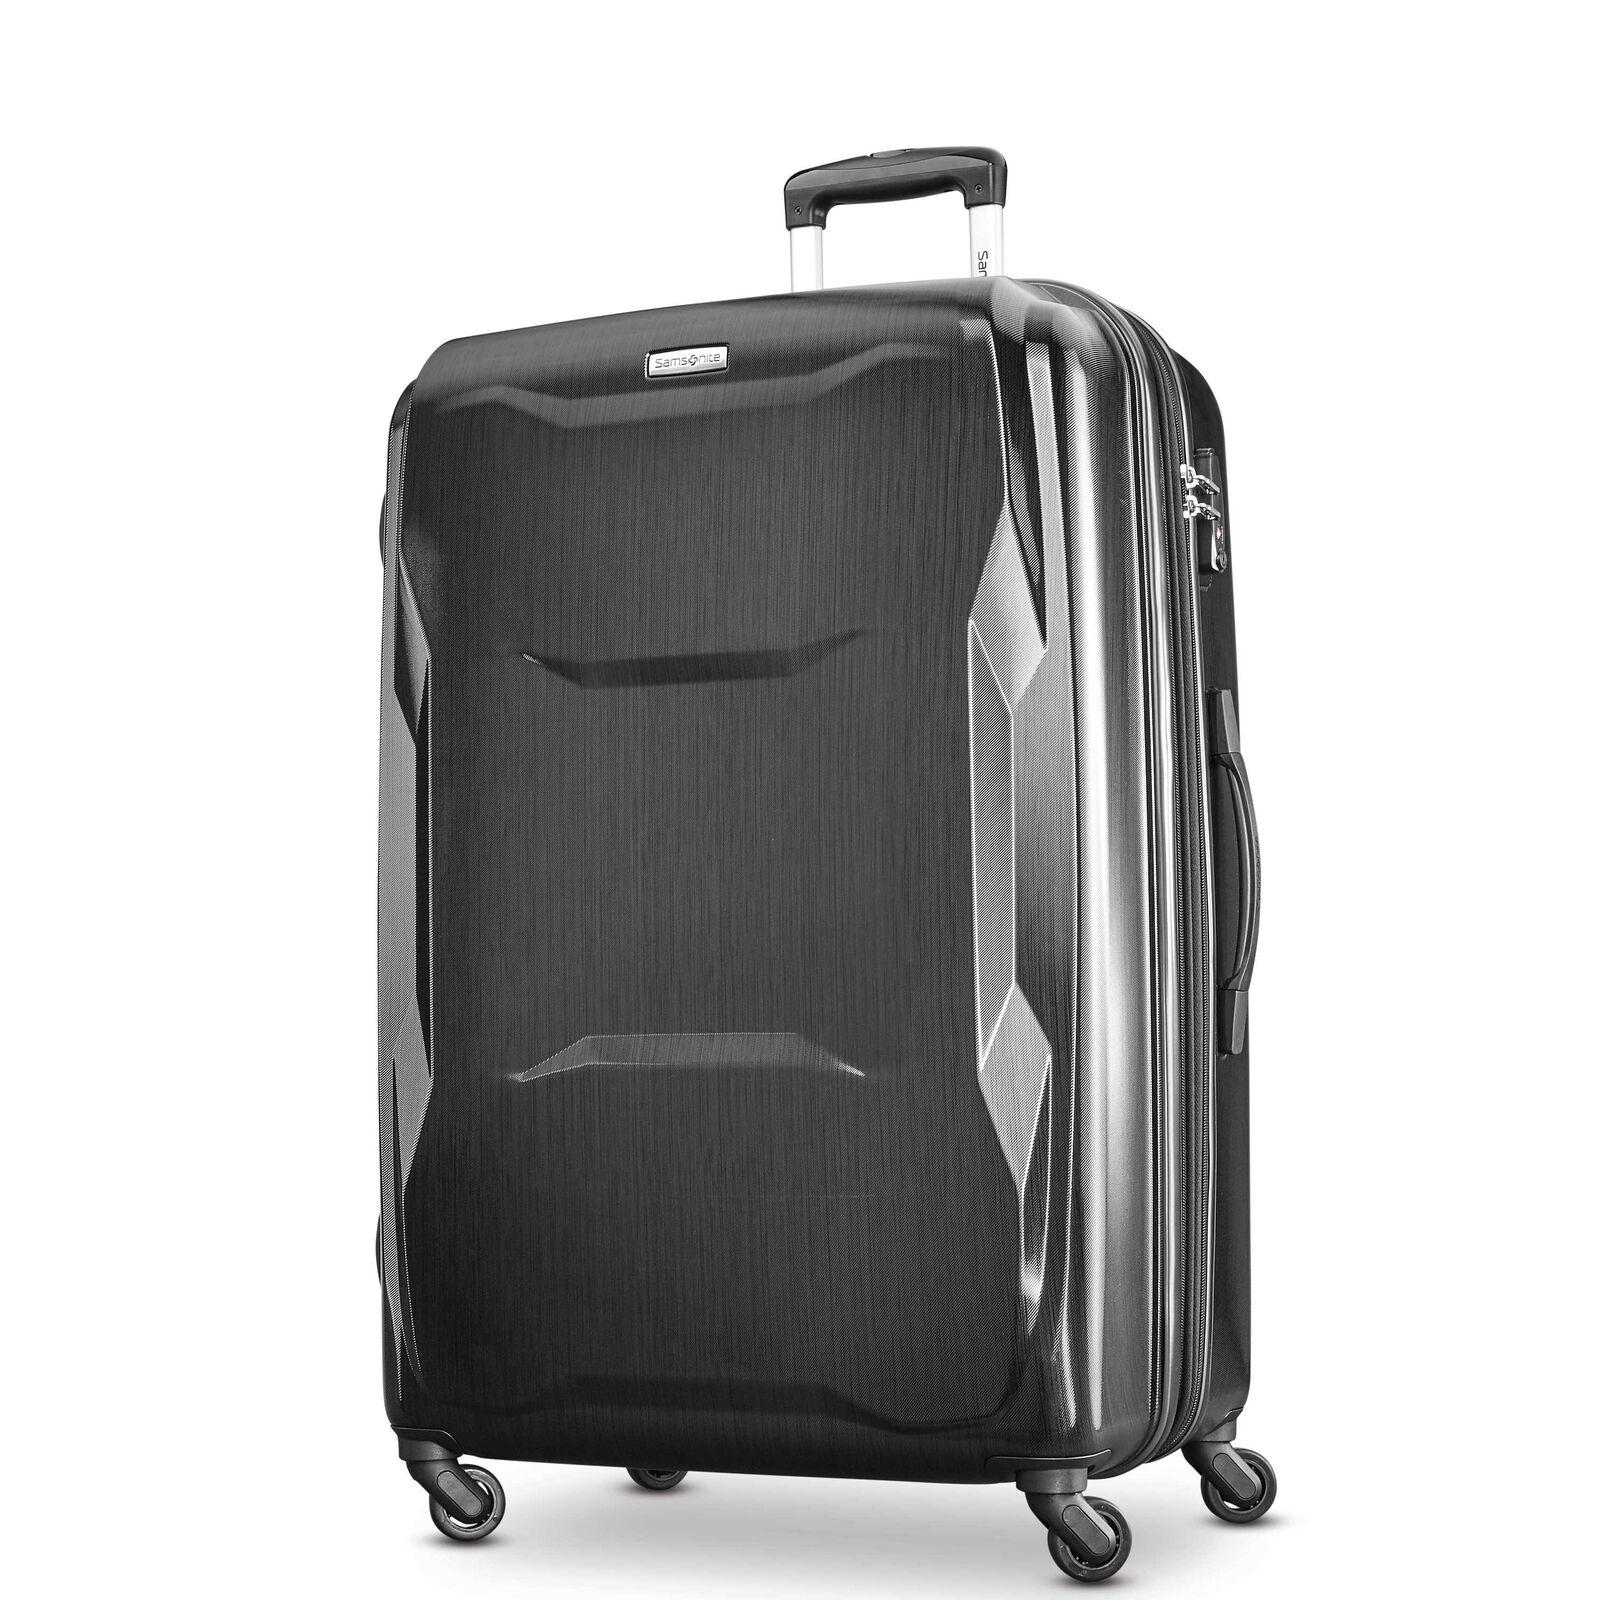 Samsonite Fiero Spinner - Luggage - s l1600